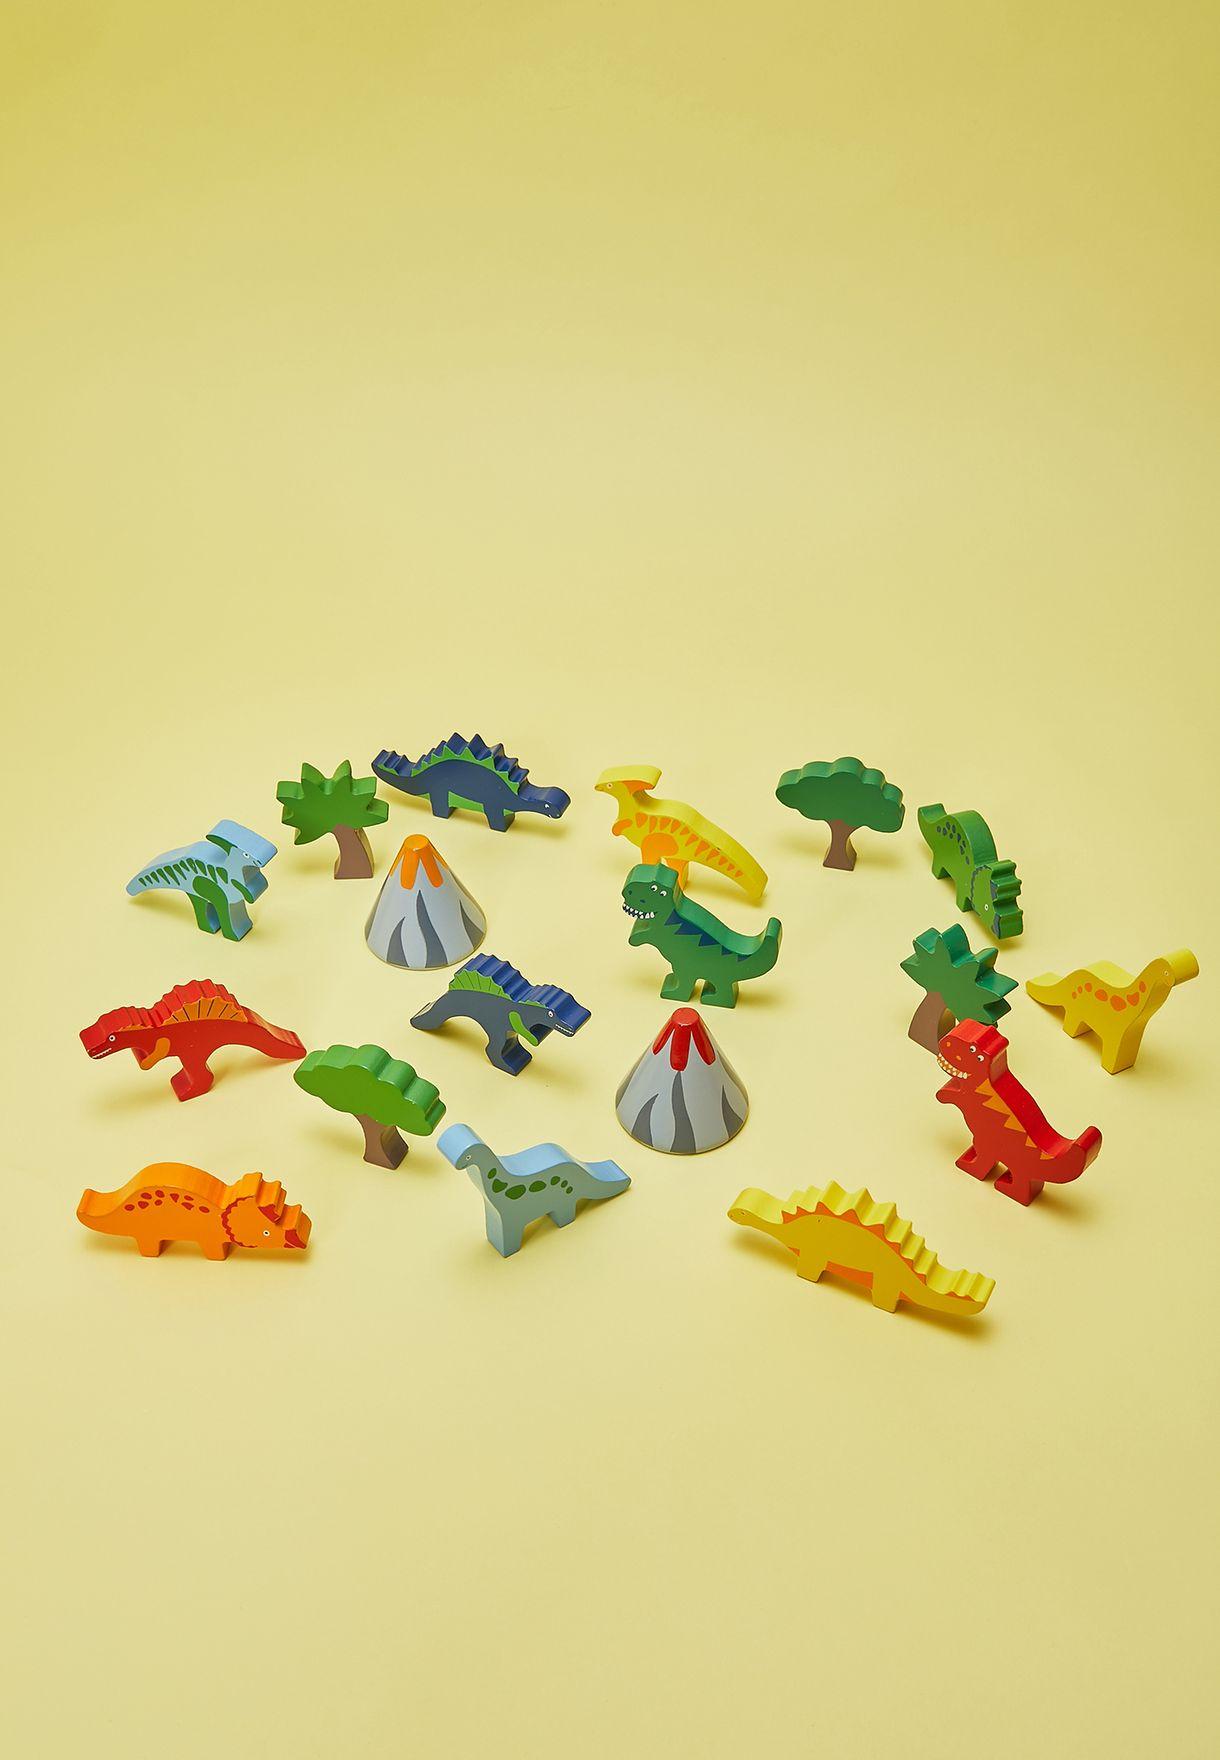 لعبة ديناصورات